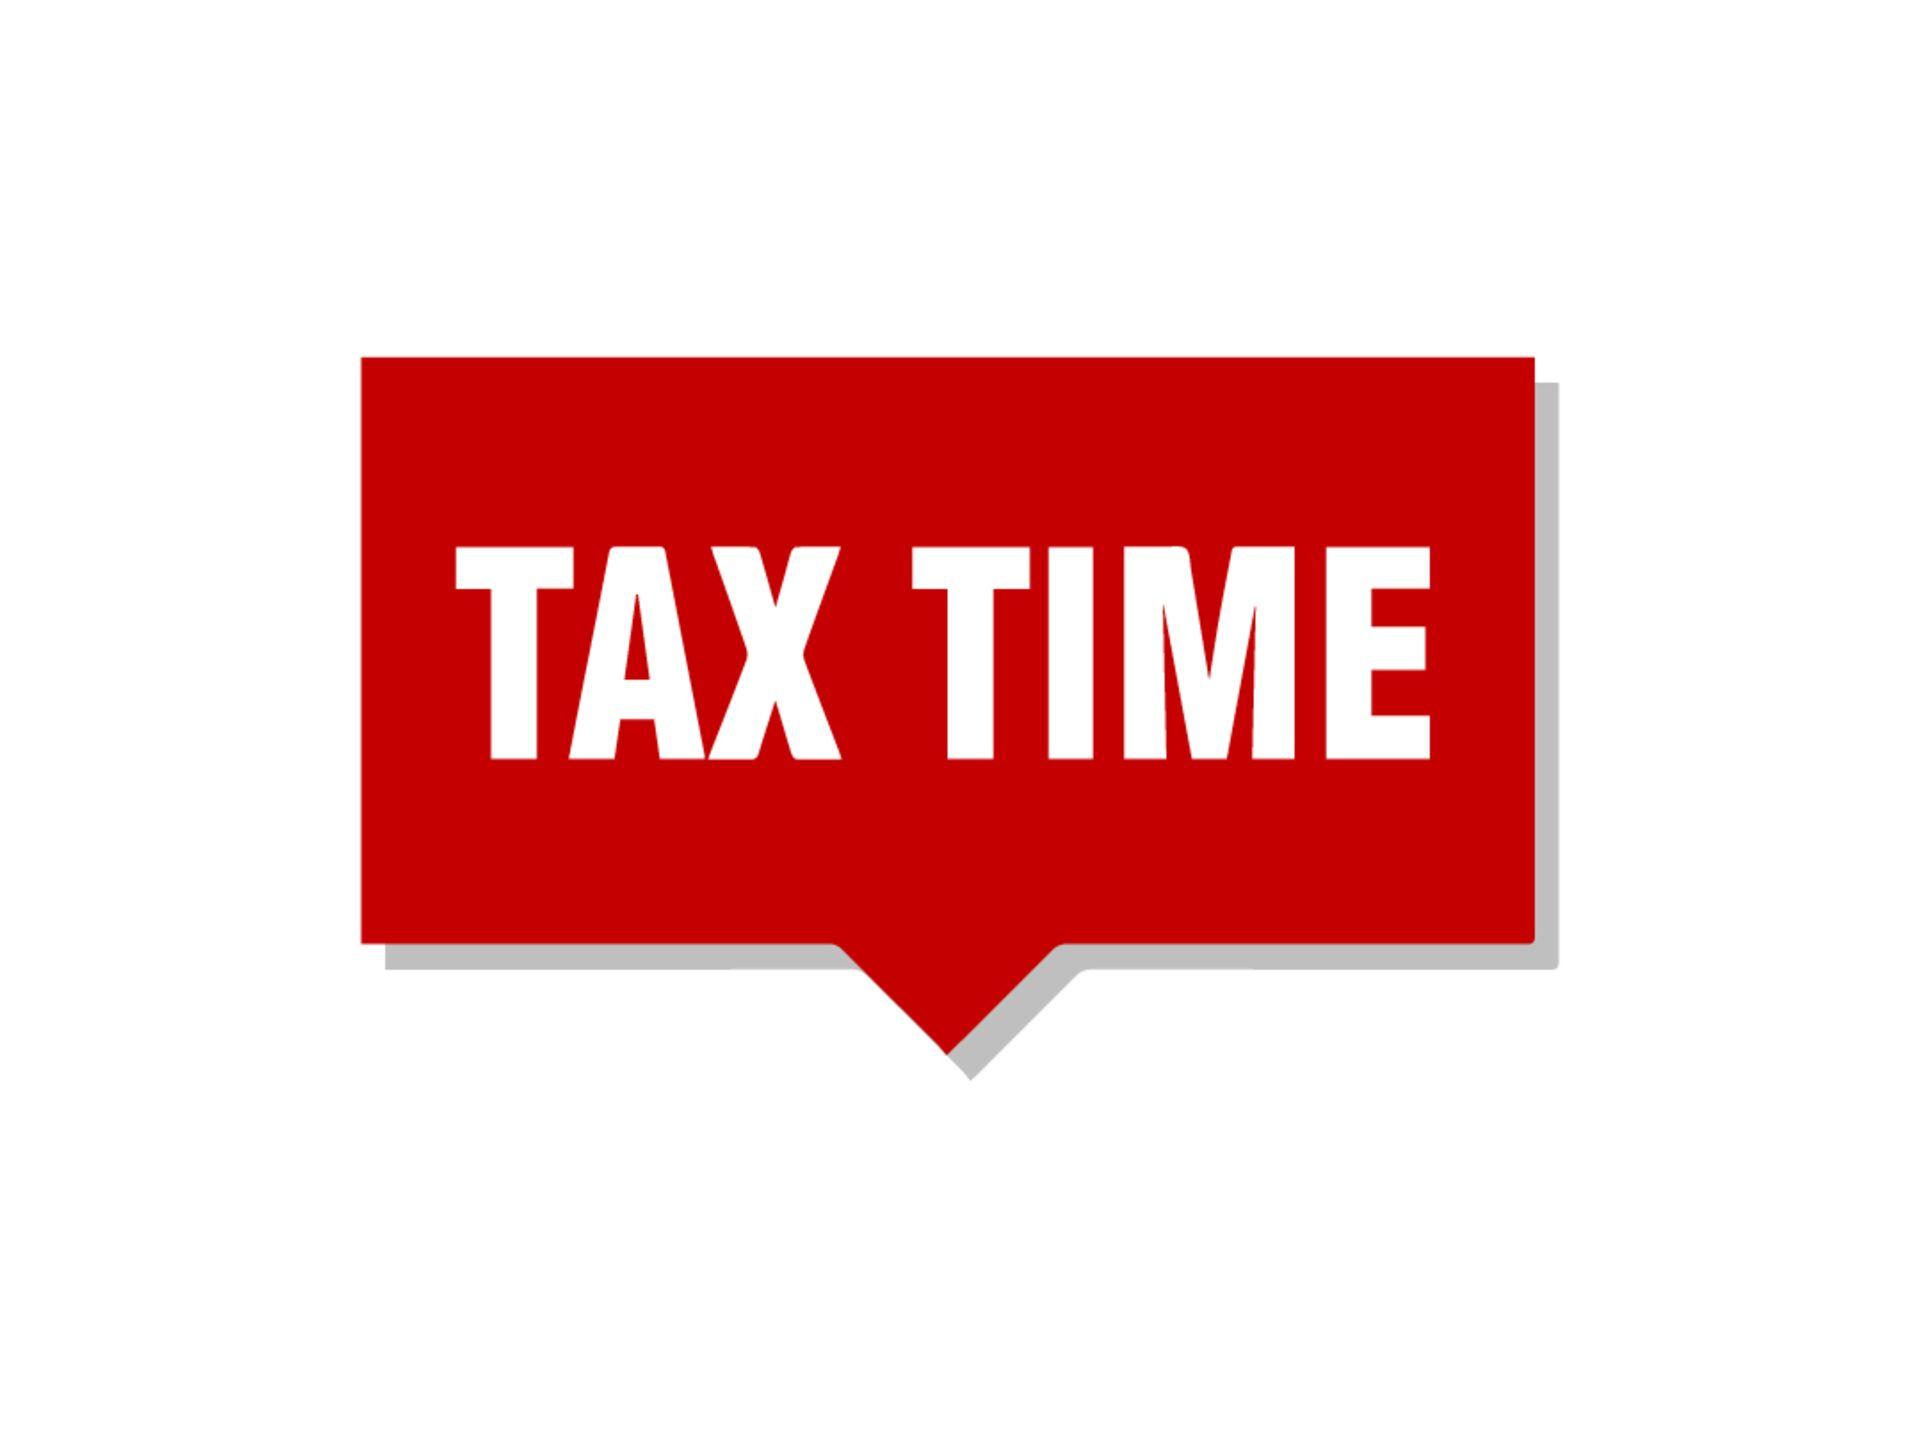 Principal Residence & Taxes